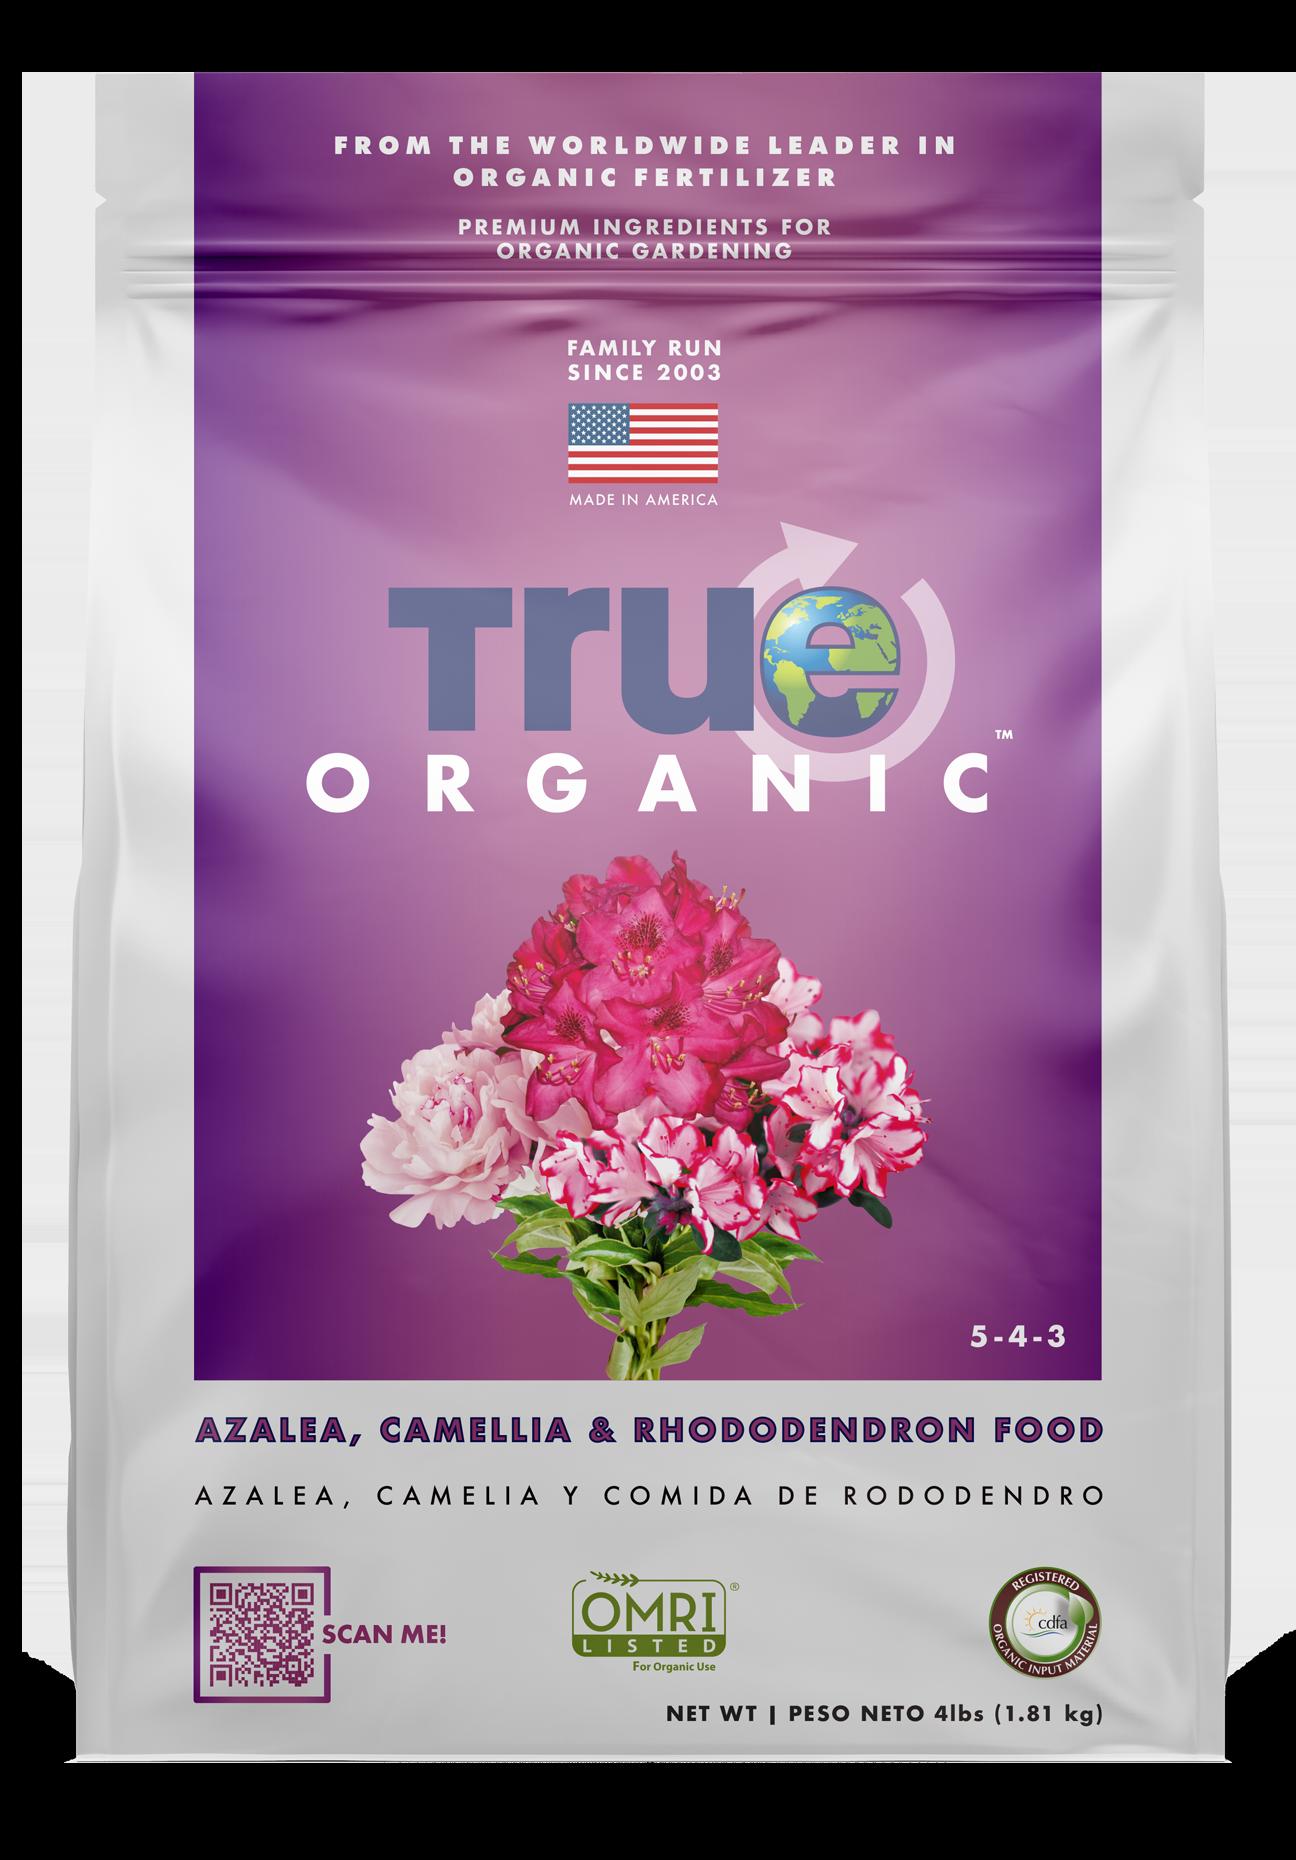 Bag Of True Organic Azalea Camellia & Rhododendron Food